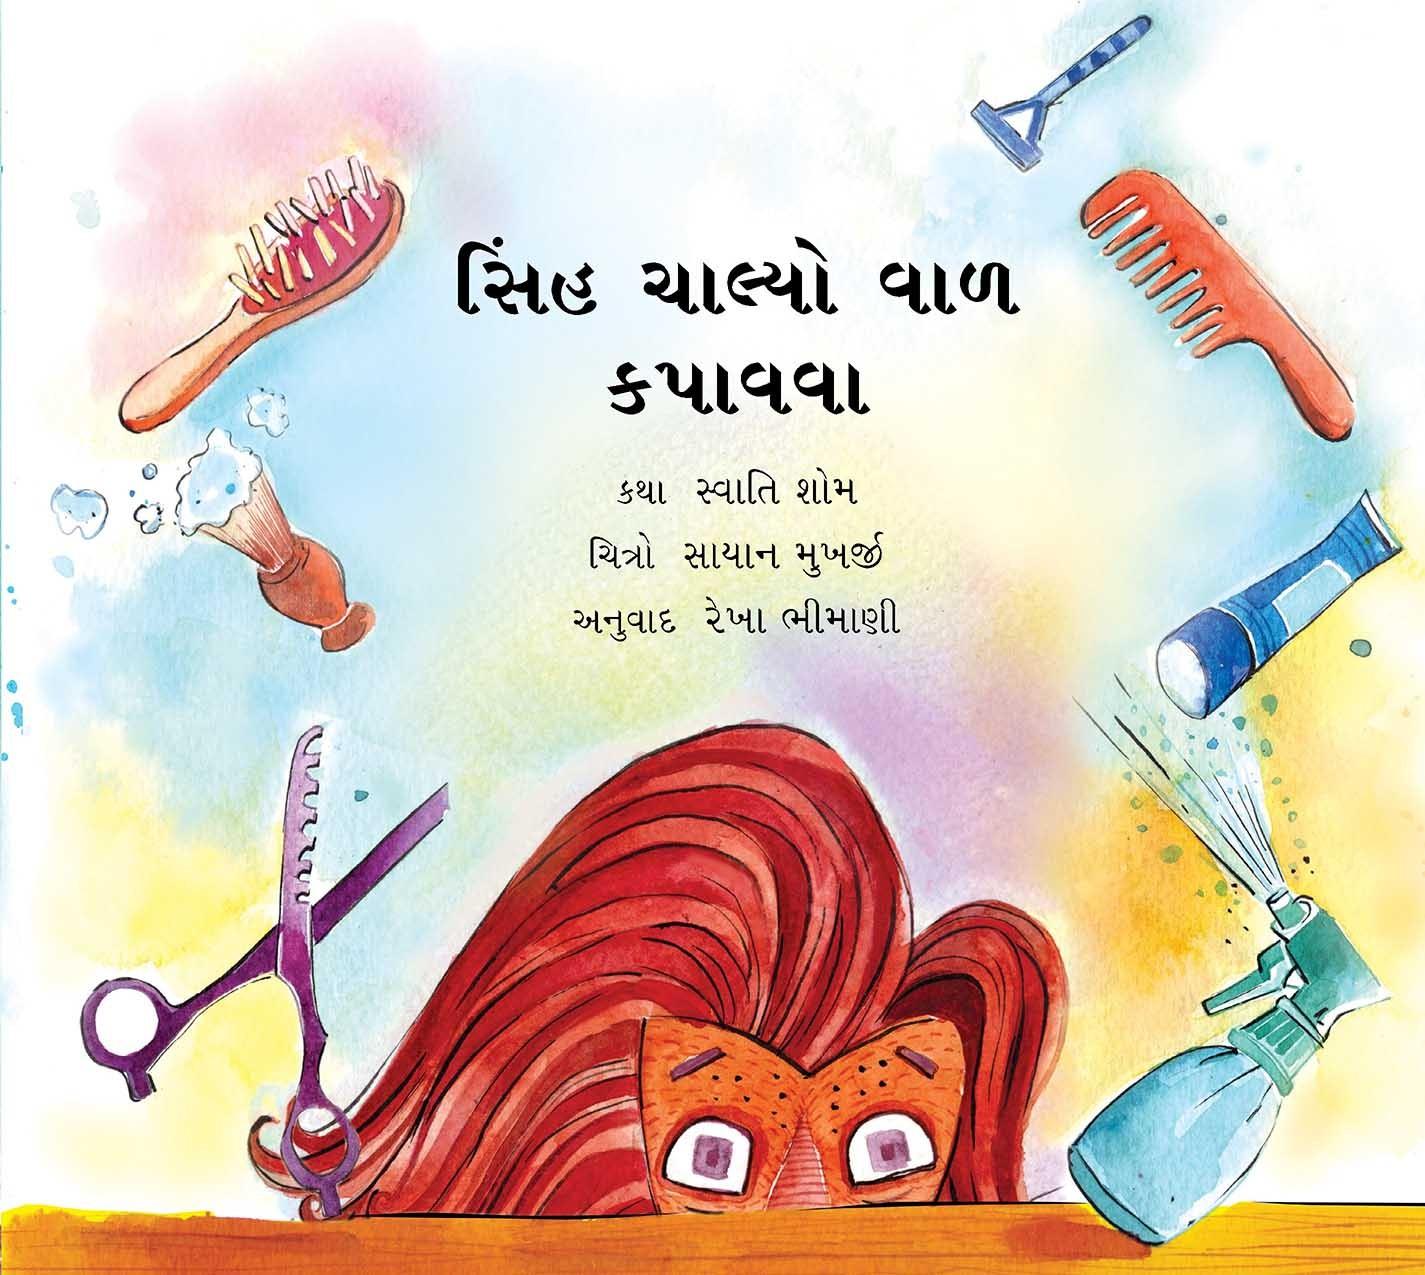 Lion Goes for a Haircut/Sinh Chaalyo Vaal Kapaavva (Gujarati)